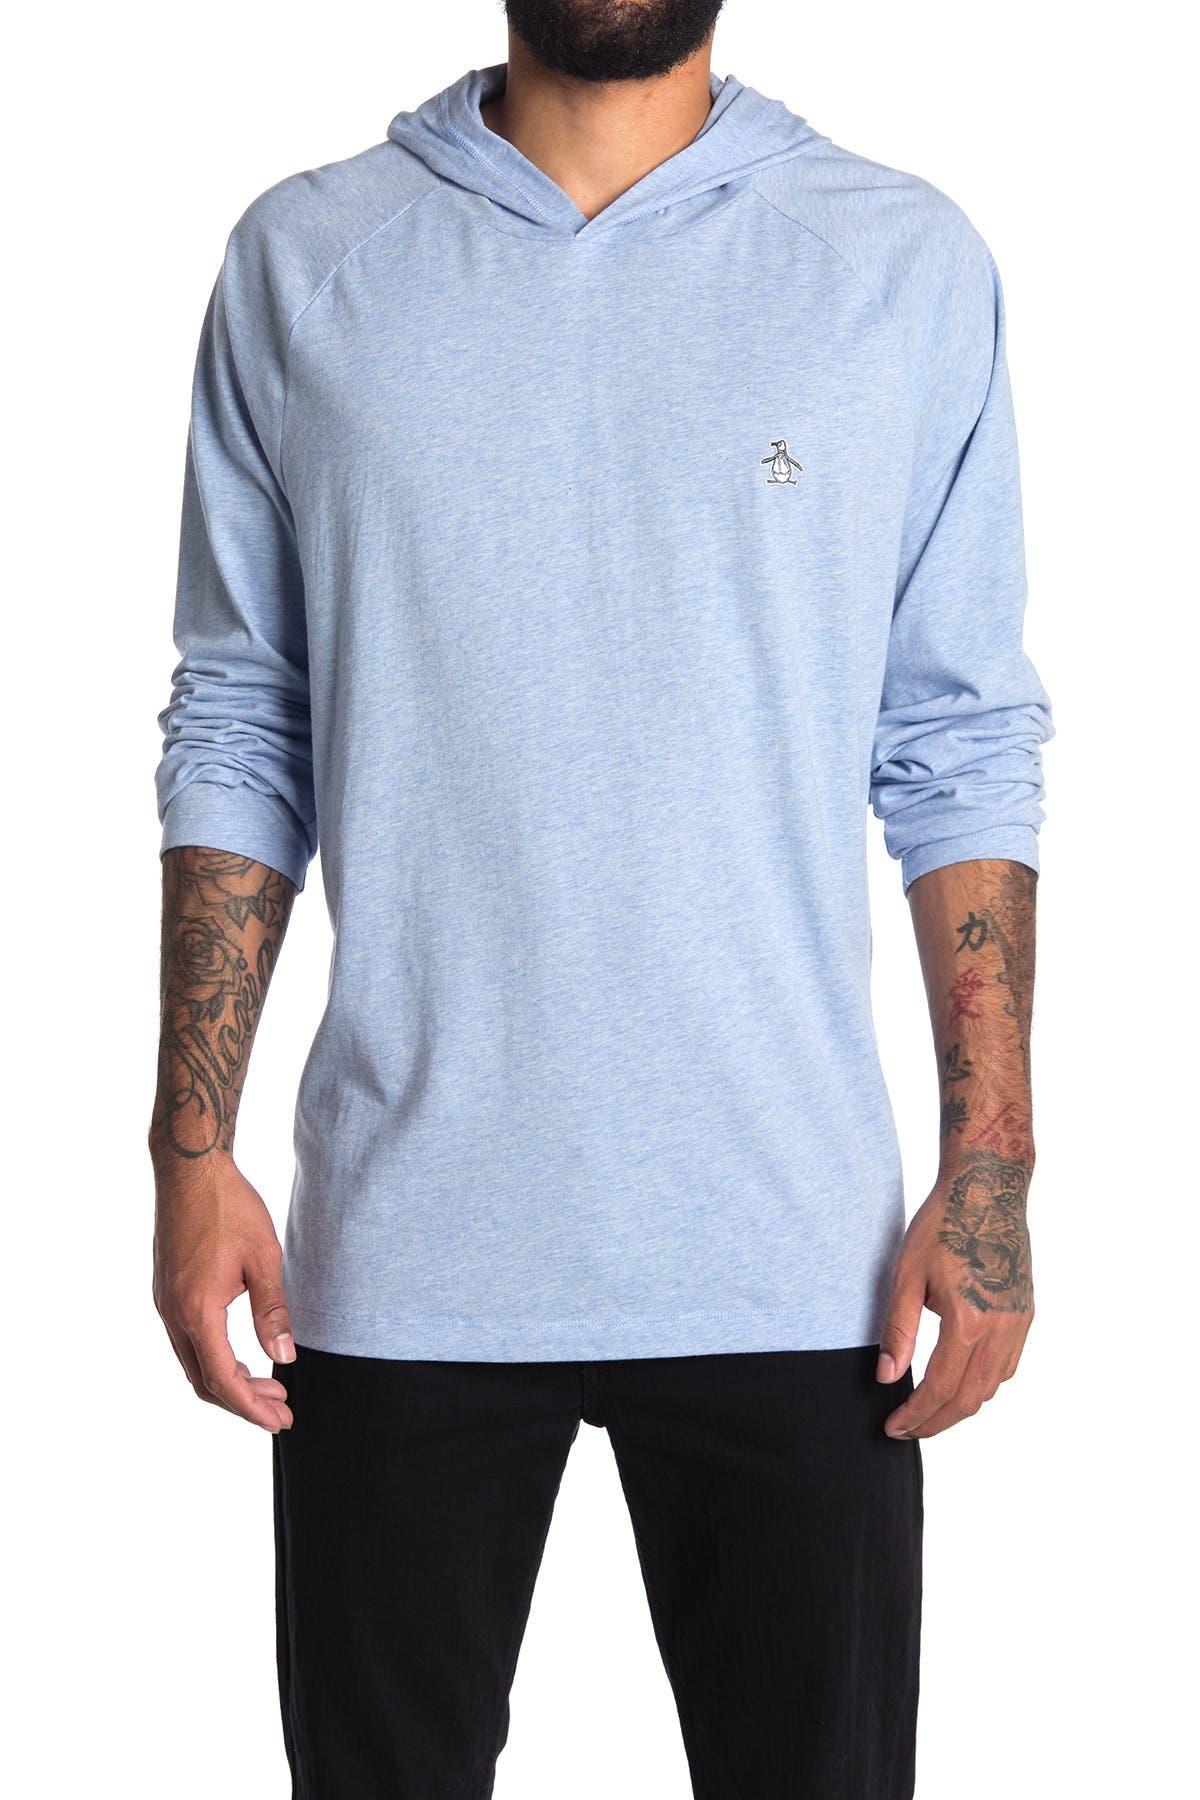 Image of Original Penguin Long Sleeve Hooded T-Shirt